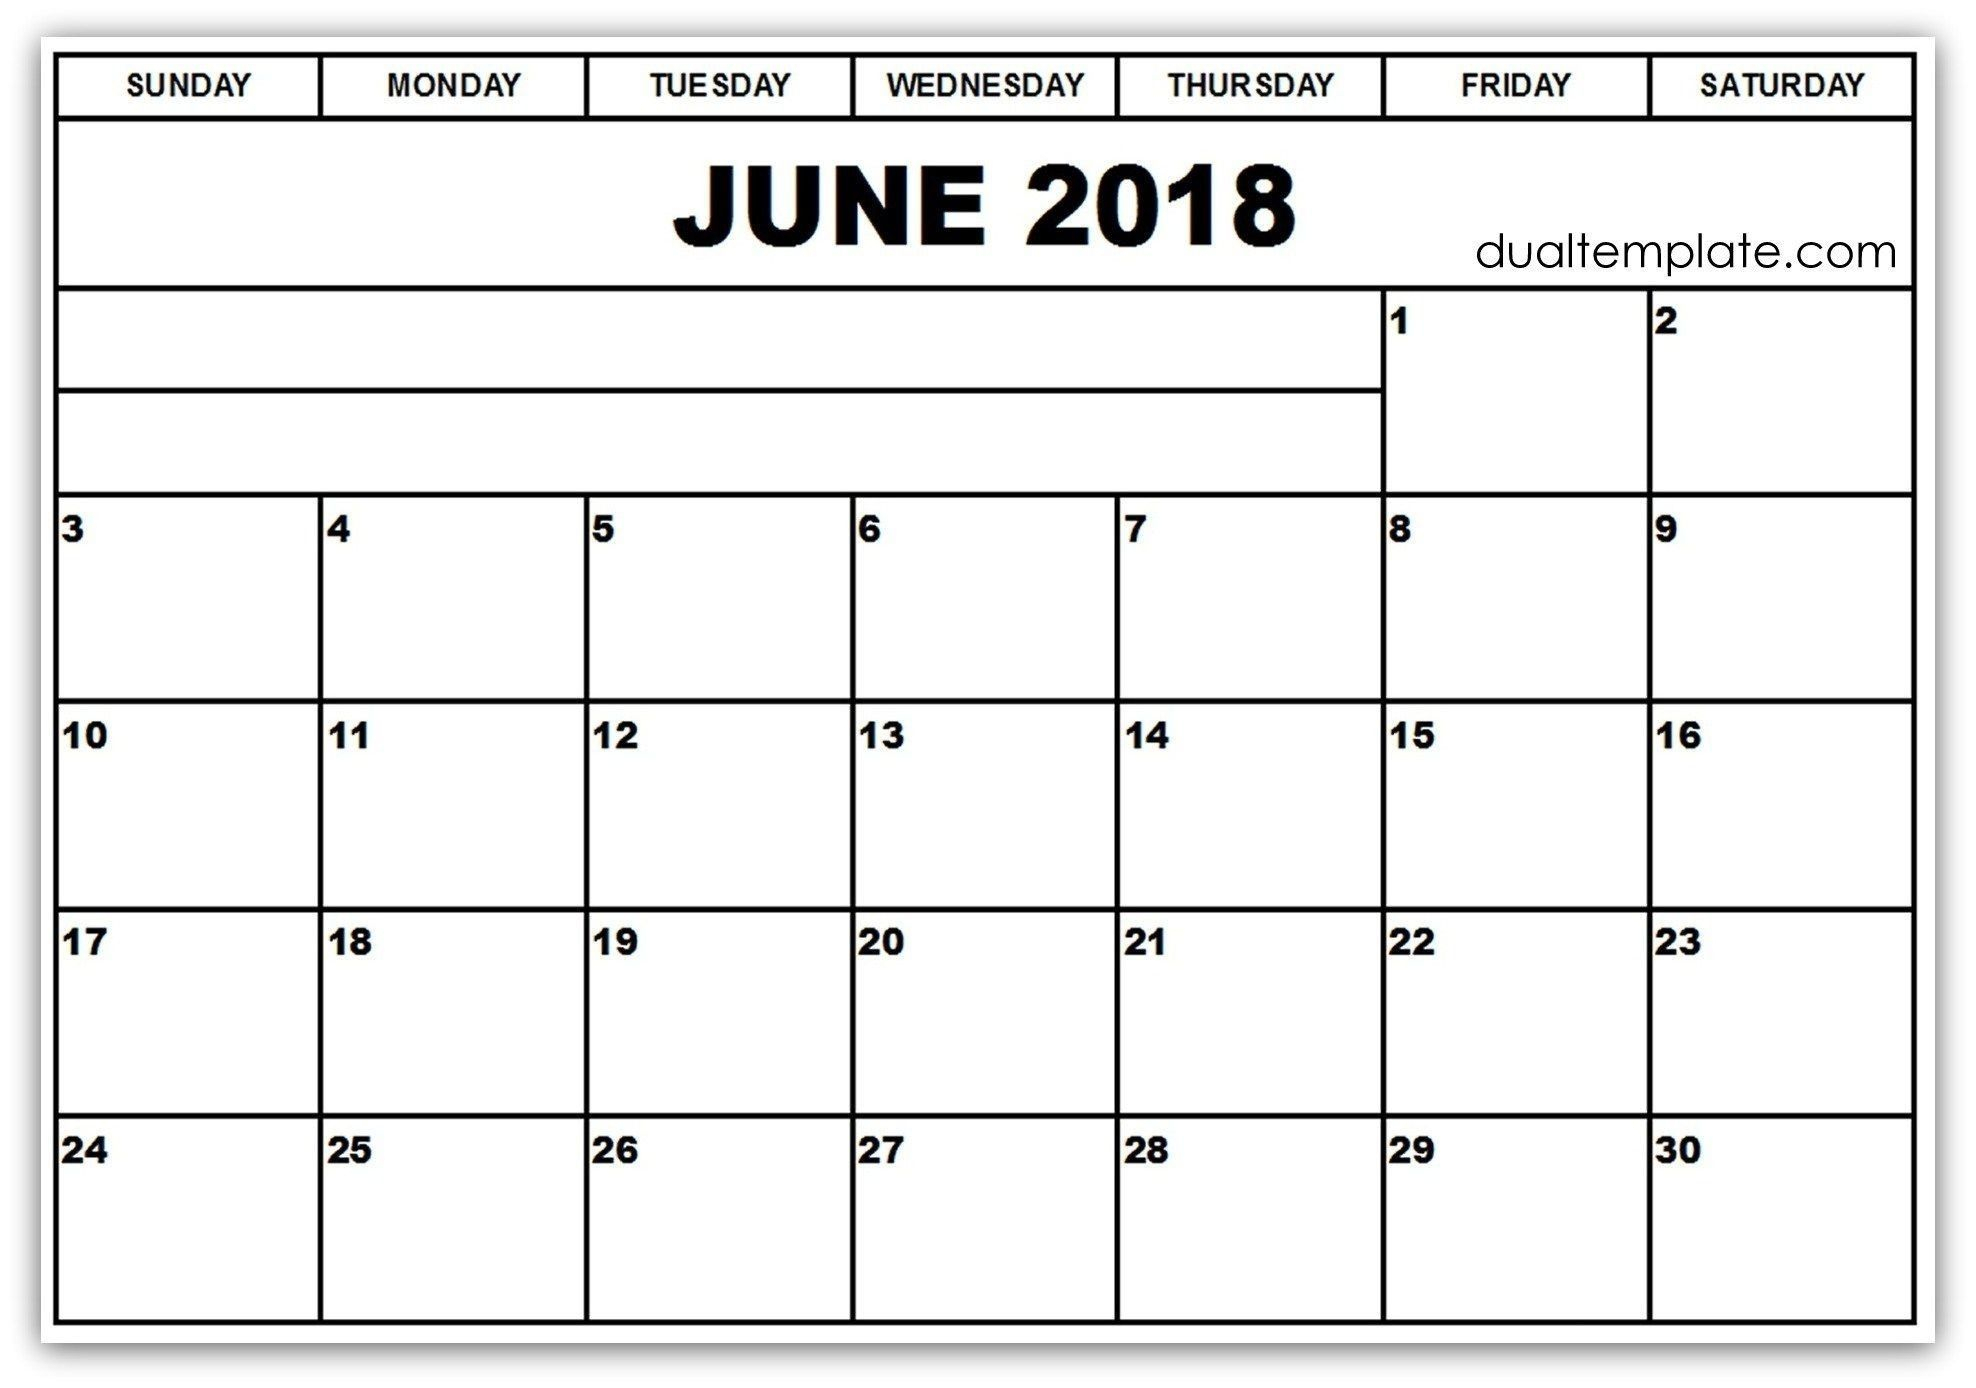 Free Printable Weekly Calendar 2019 Julian Date Calendar regarding Julian Calendar 2018